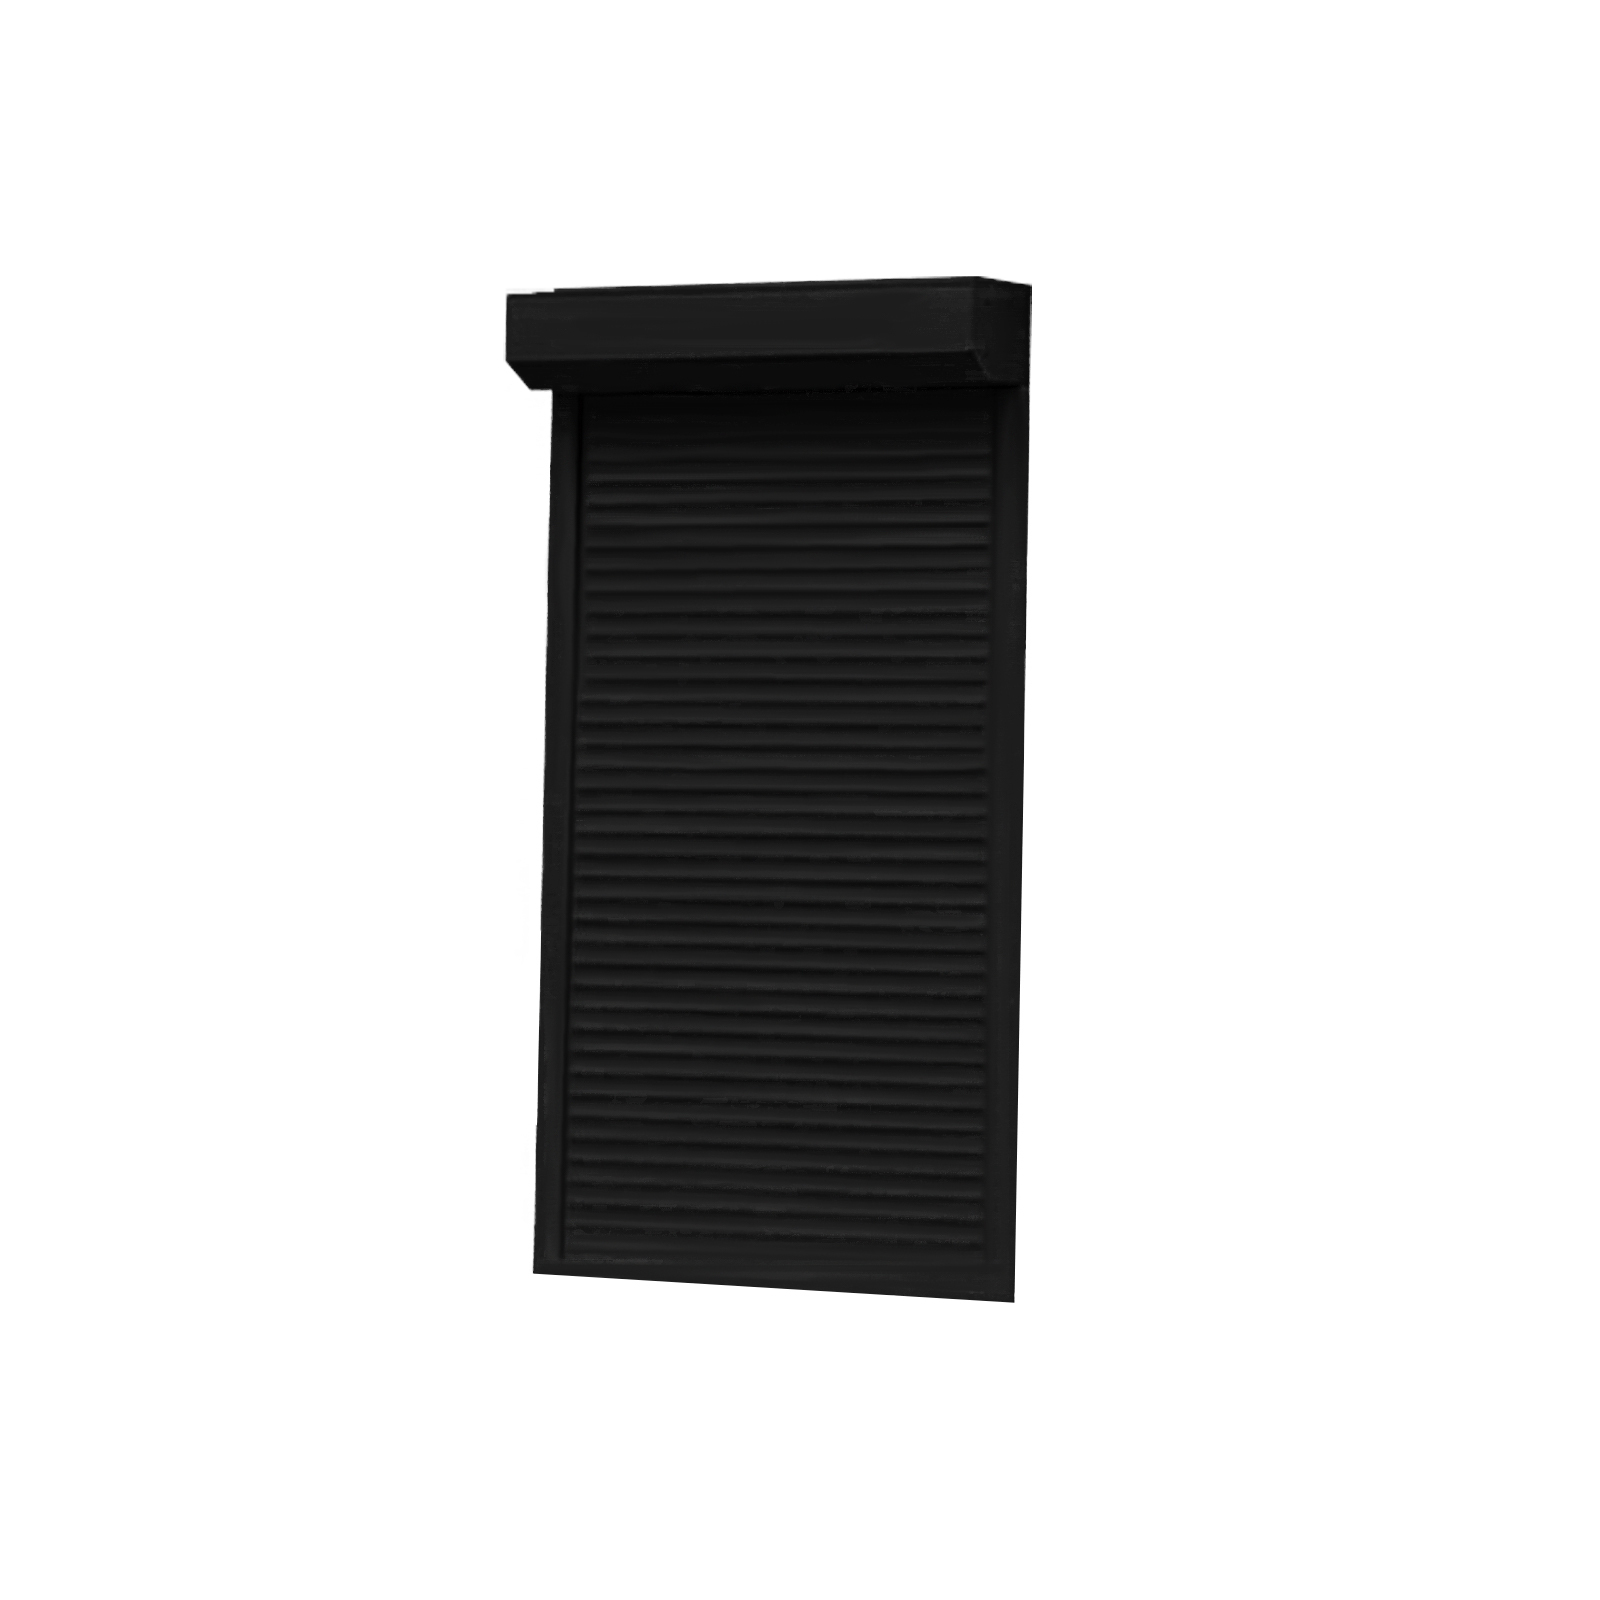 Everton 1601-1800 x 1601-1800mm On-Wall Hardwired Roller Shutter